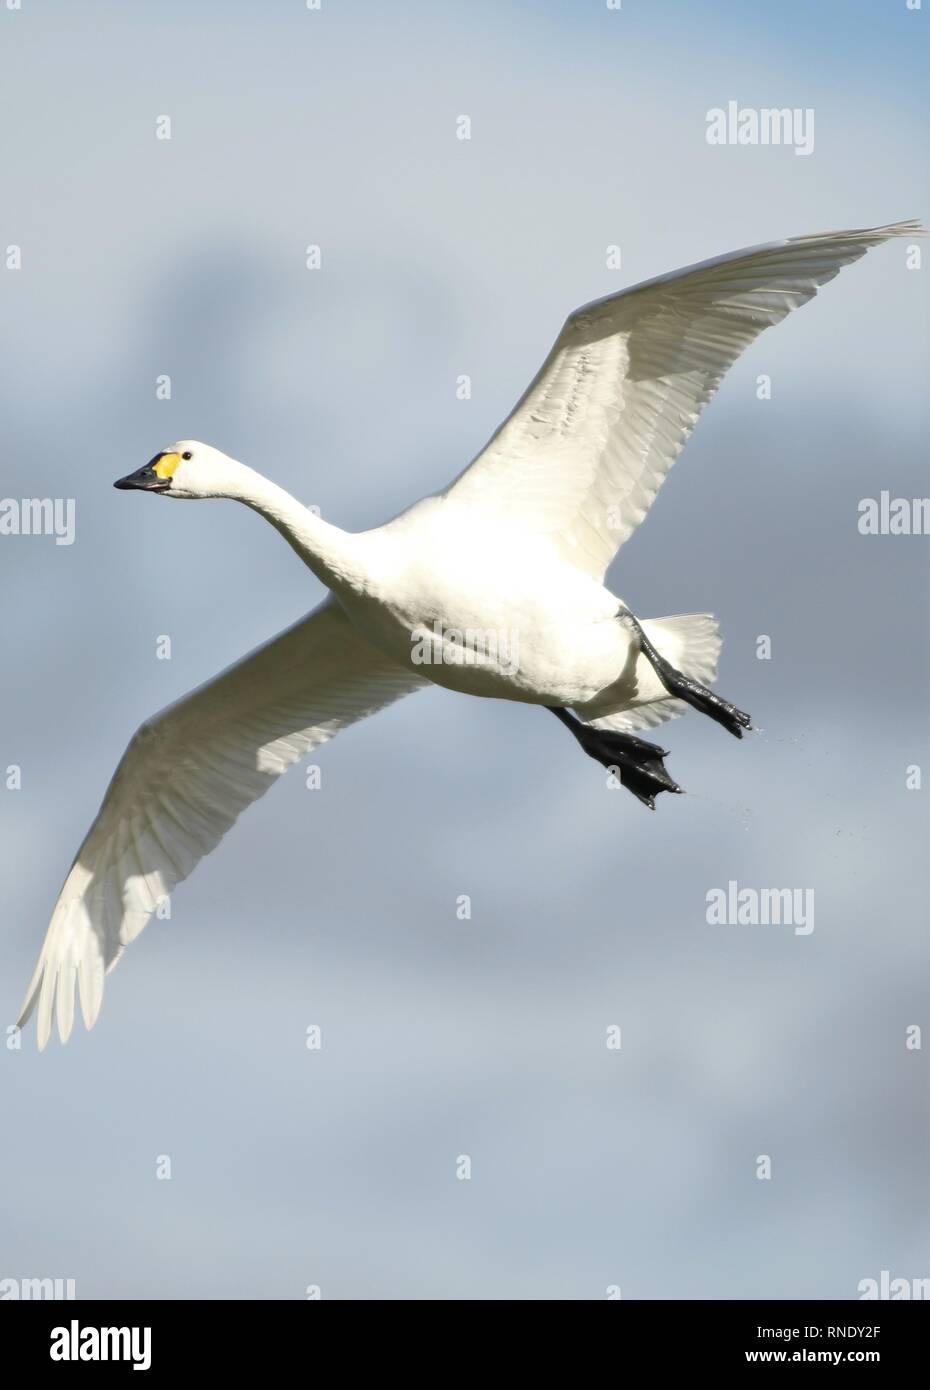 Bewick's swan (Cygnus columbianus bewickii) in flight on sunny winters day. February 2019, Gloucestershire, UK Stock Photo